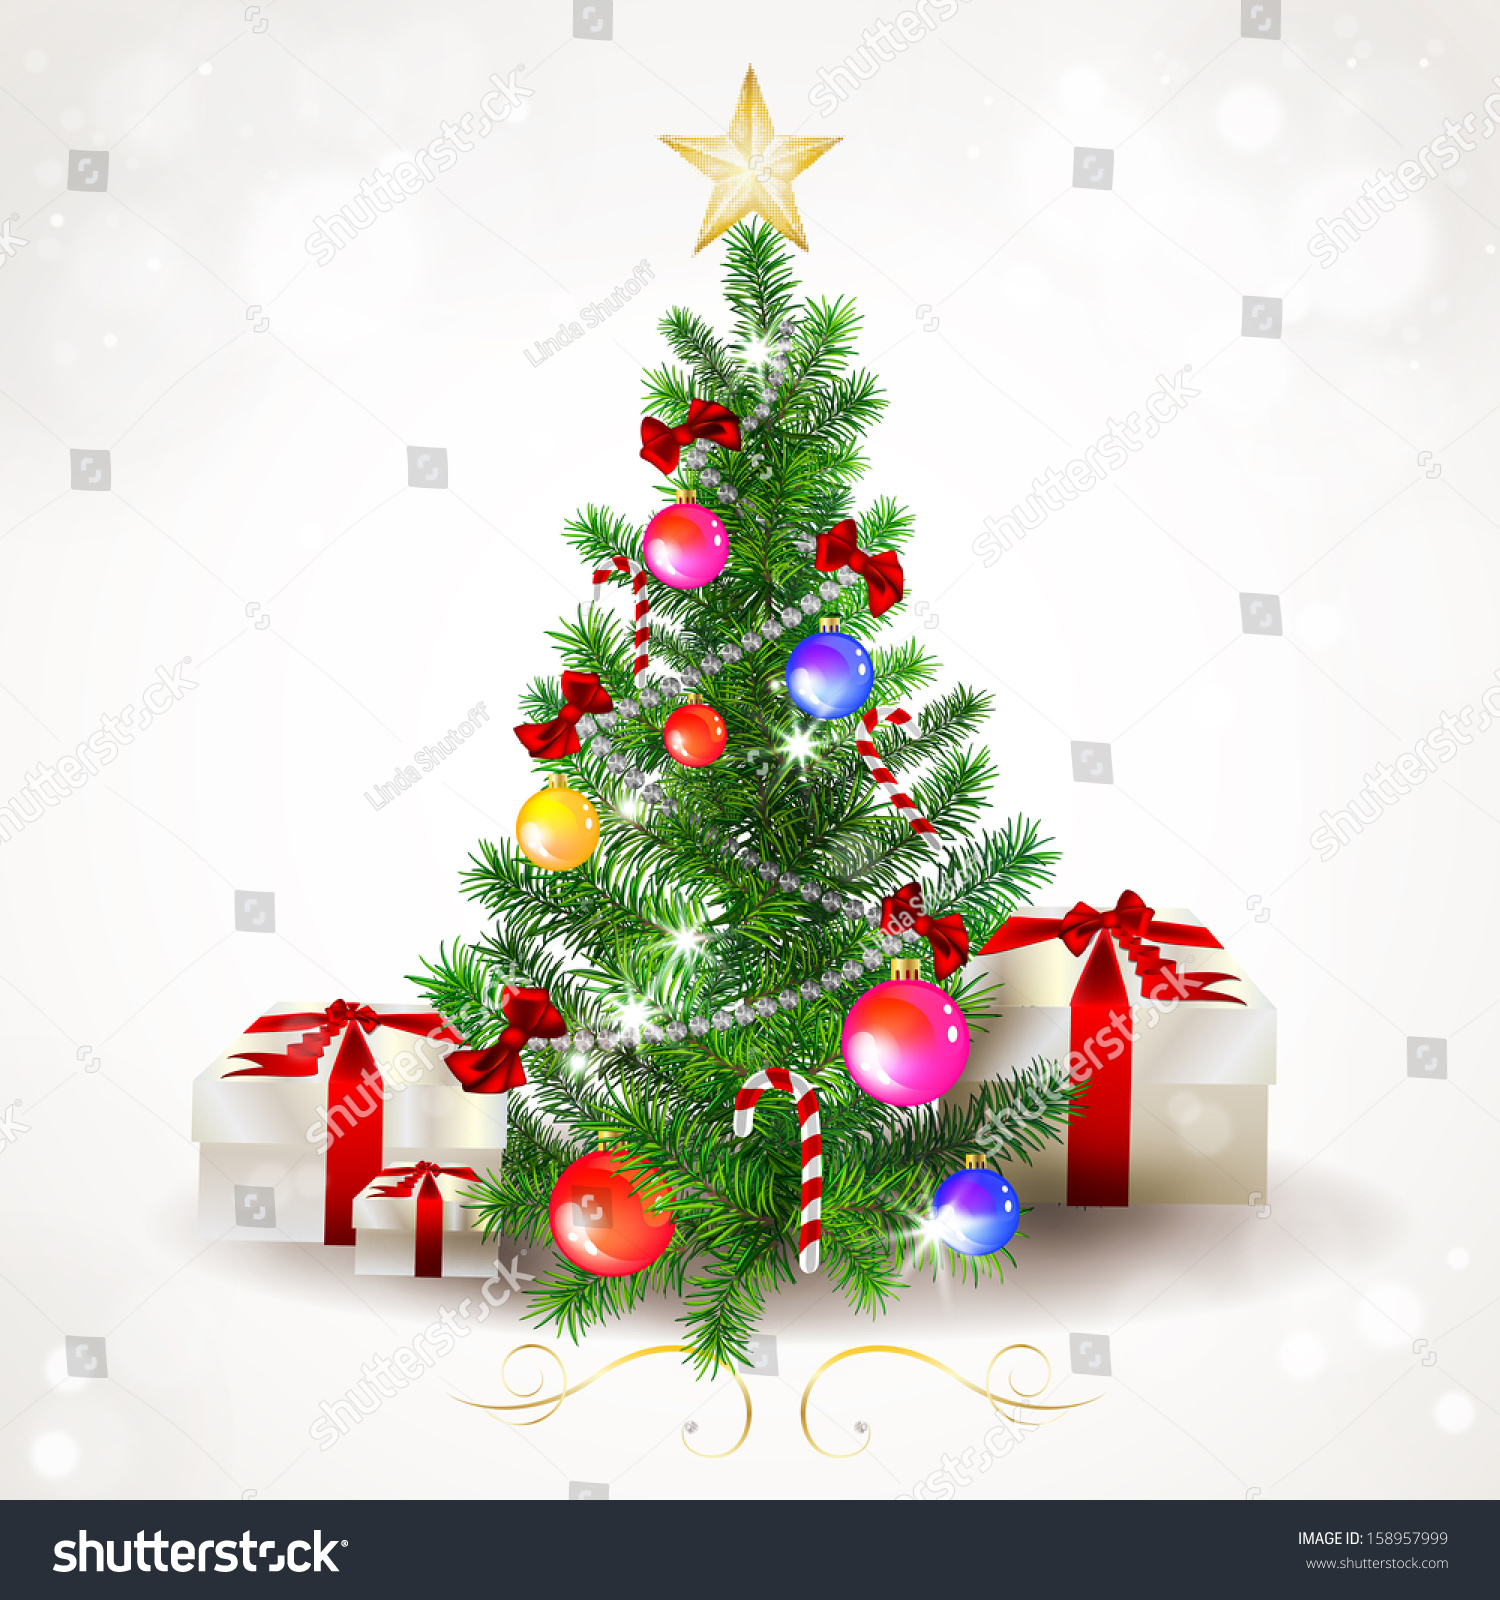 Illustration Decorated Christmas Tree Stock Illustration 158957999